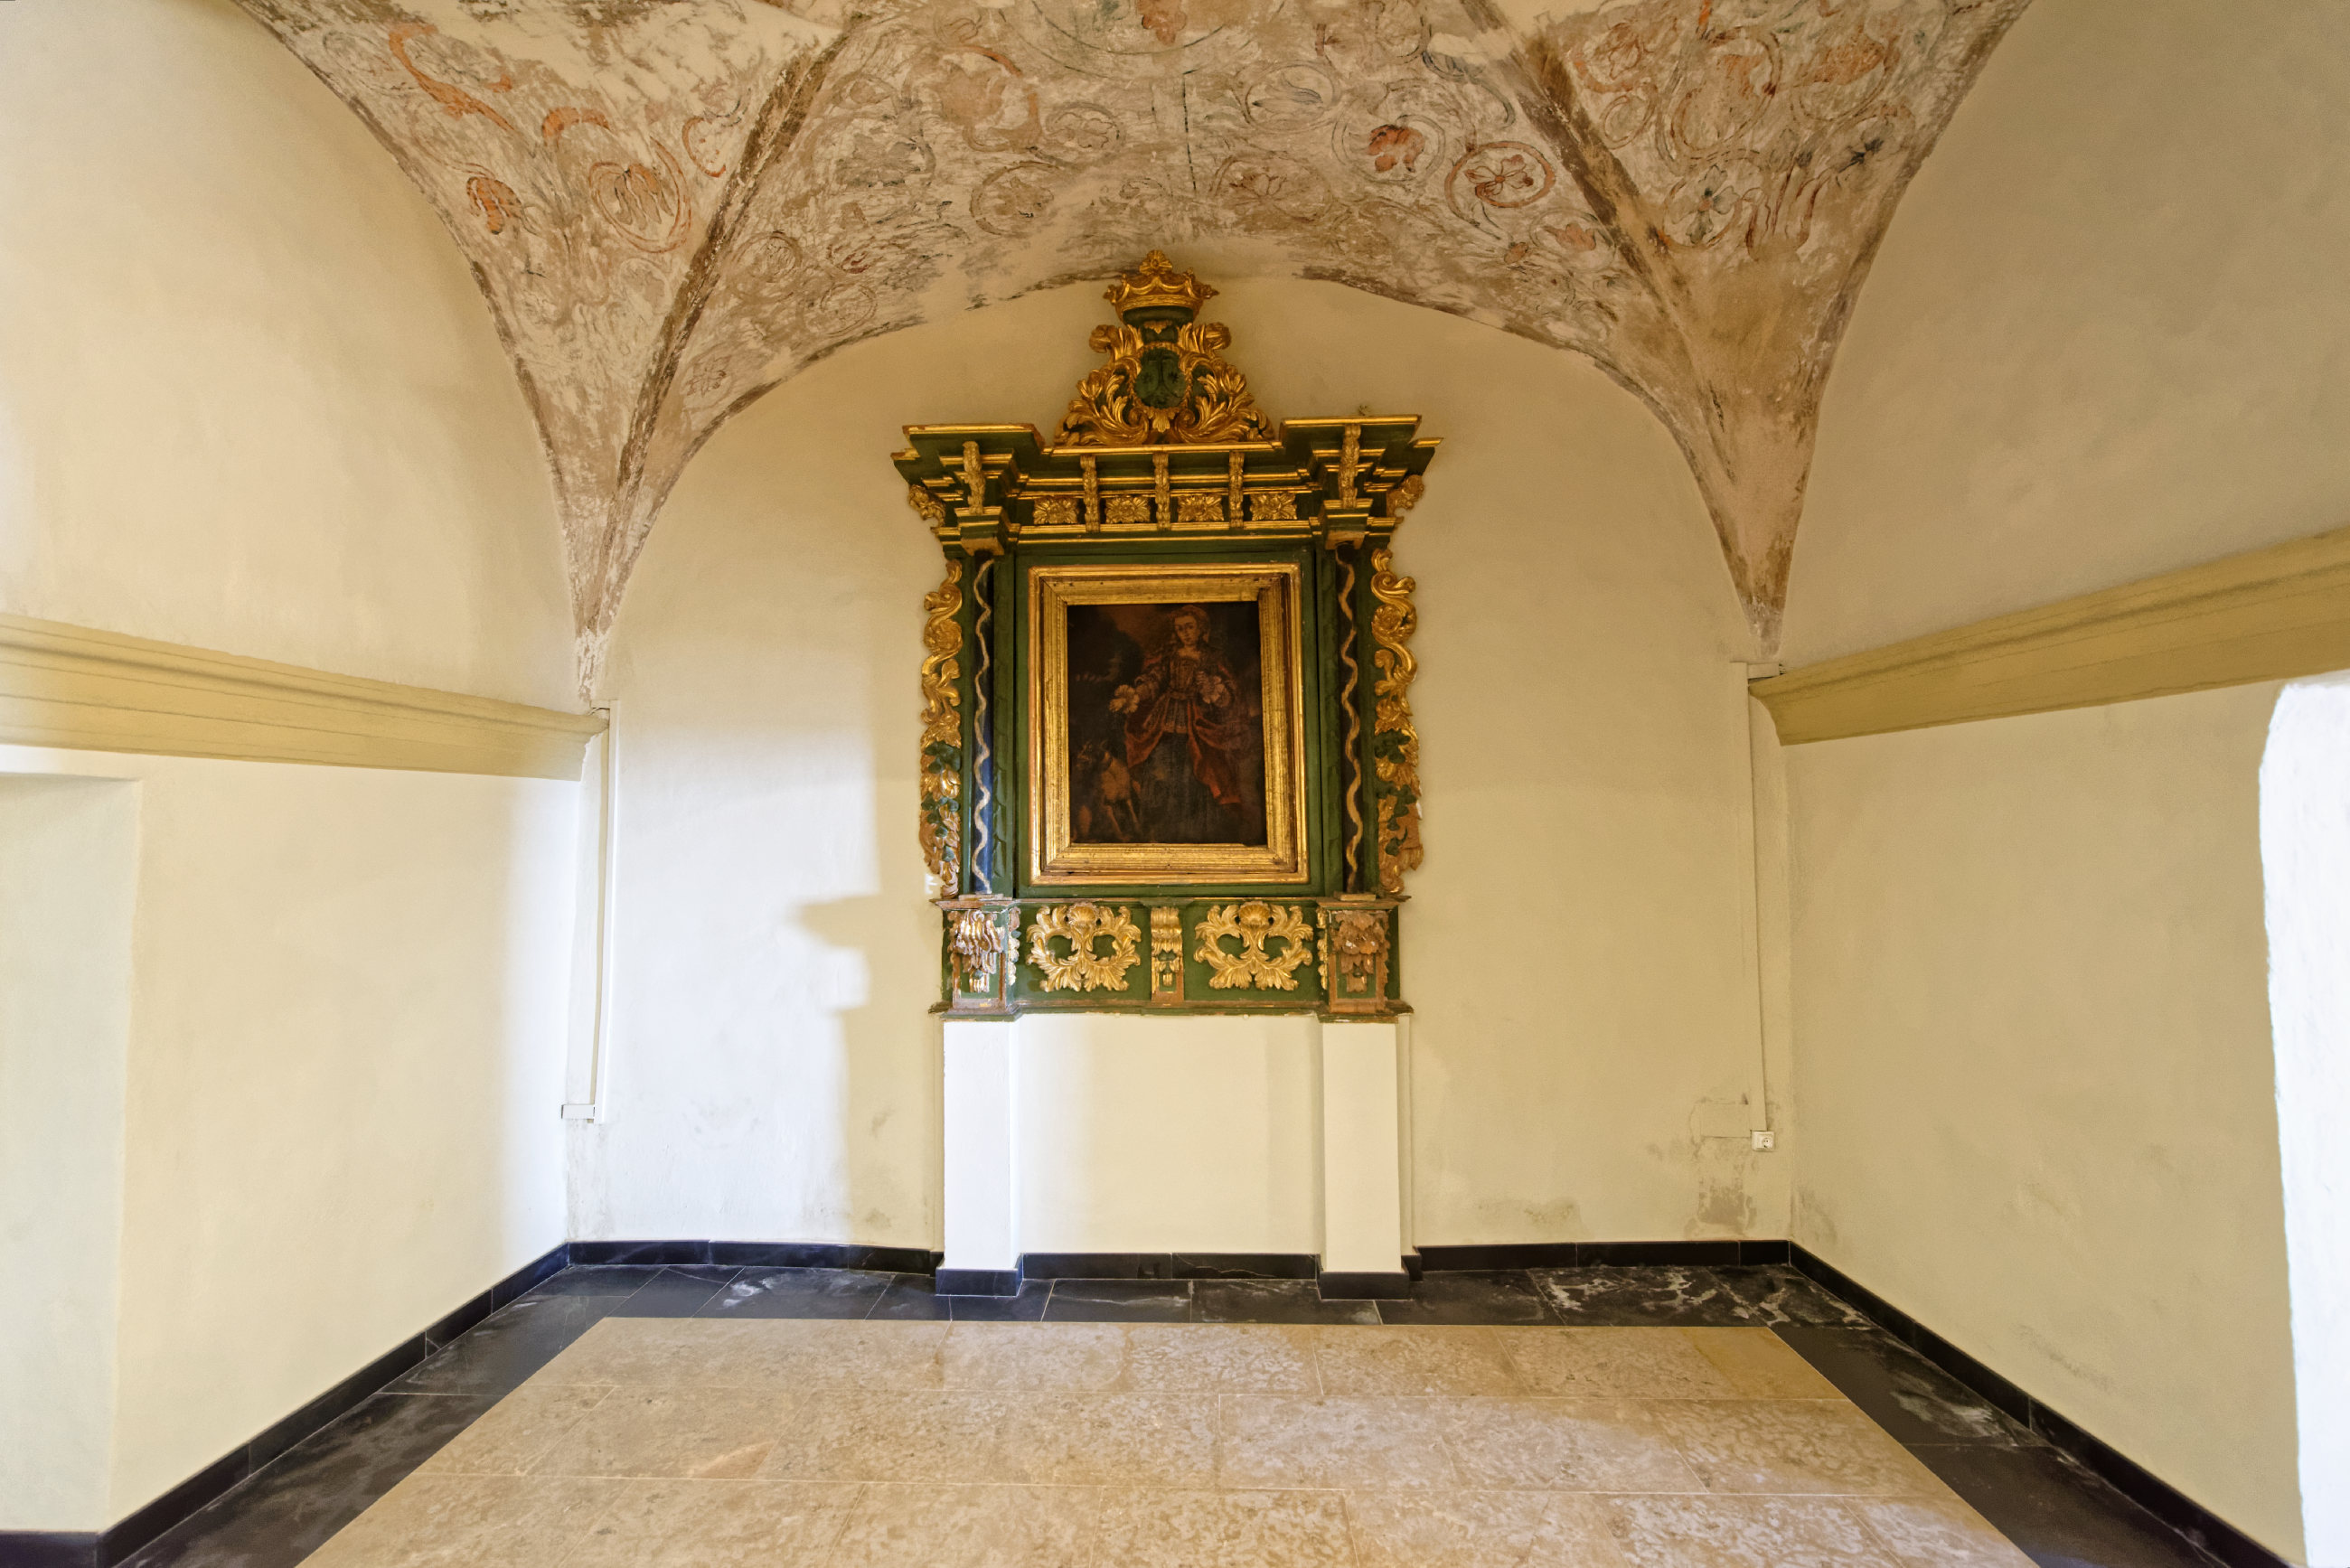 150310-Sanctuaire Sancho Abarca (Bardenas La negra) (19)